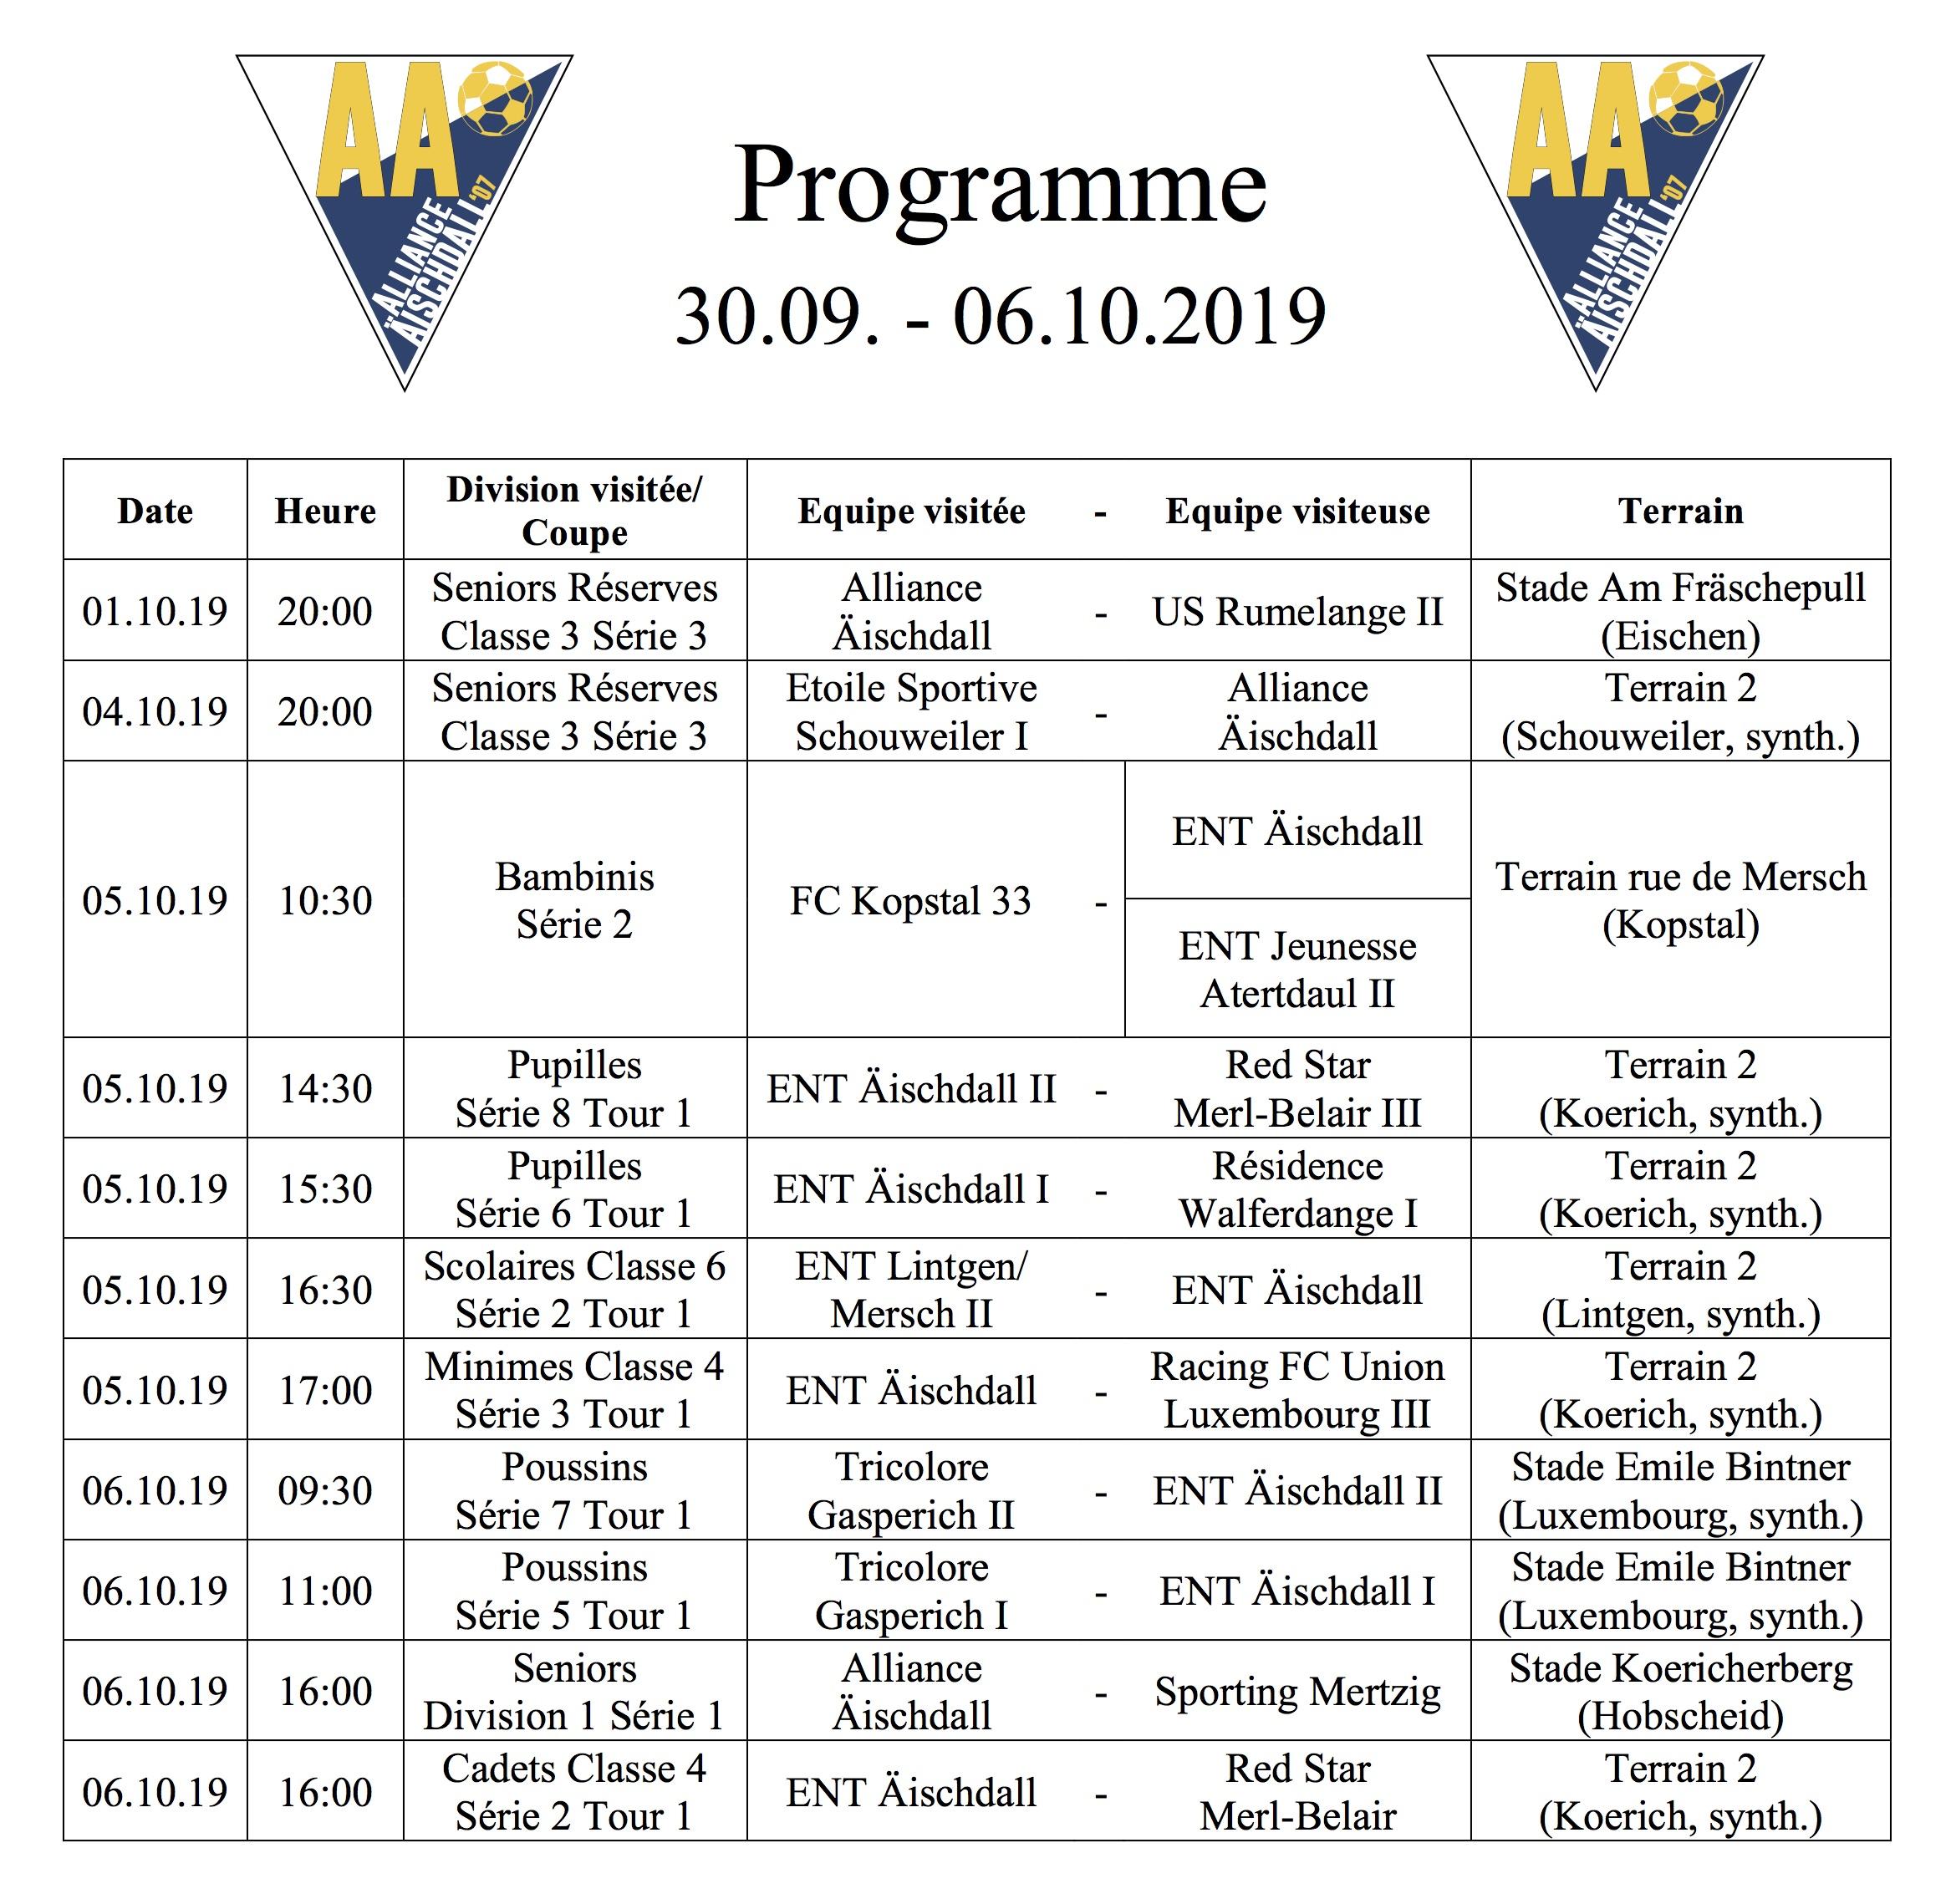 Programm 30.09.-06.10.2019